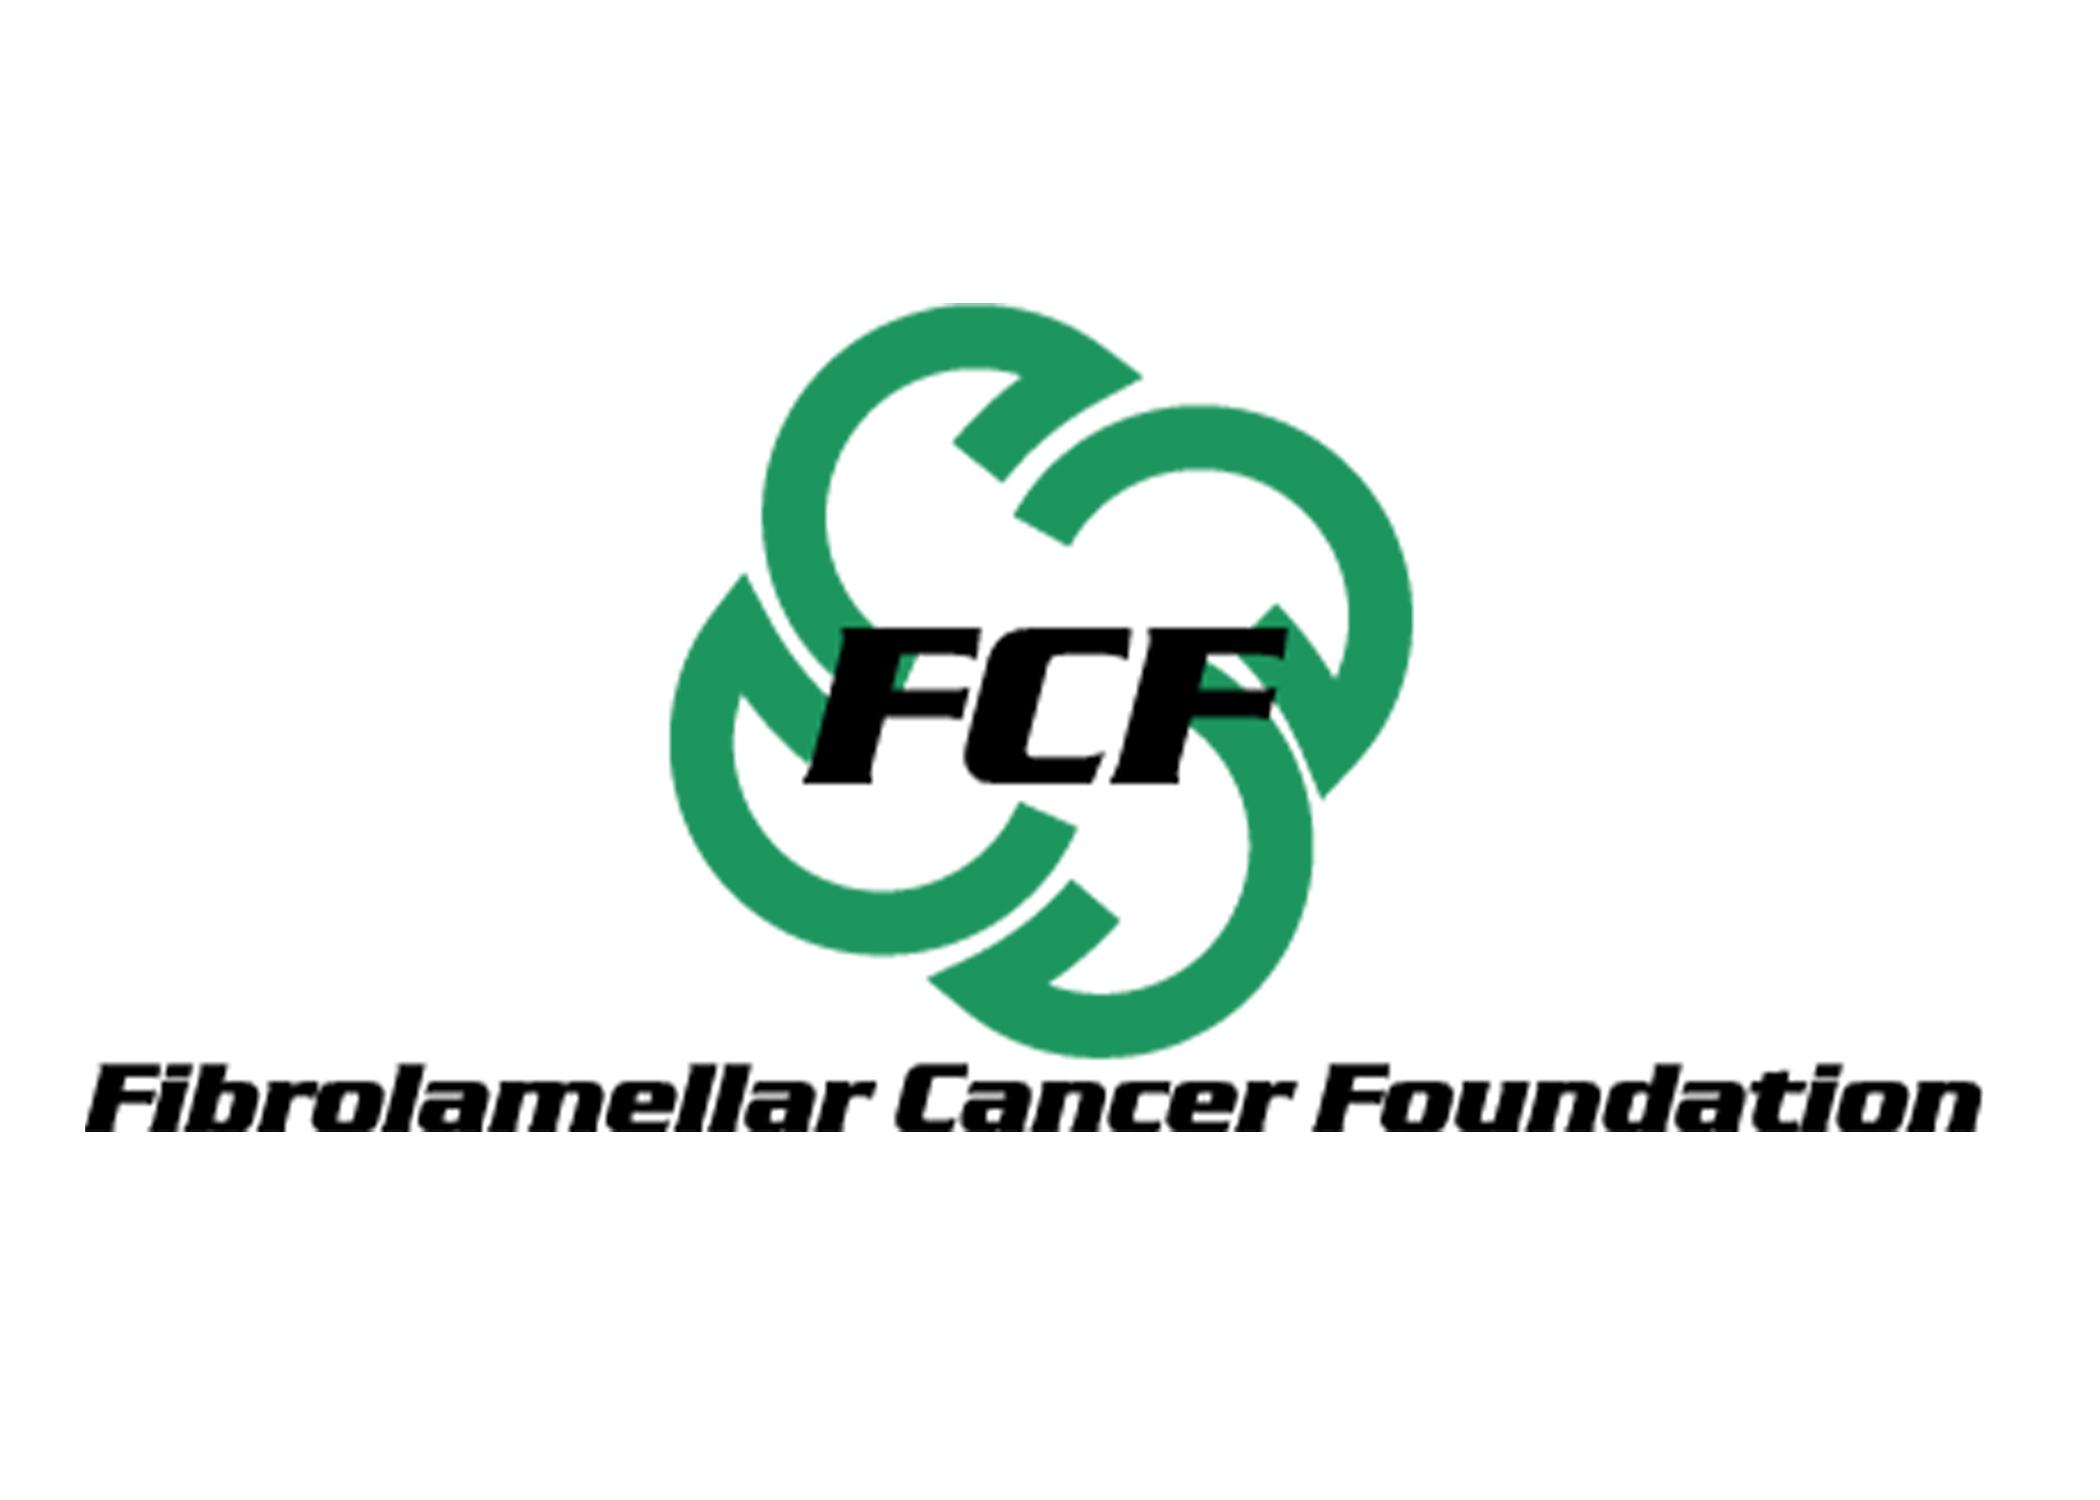 Fibrolamellar Cancer Foundation